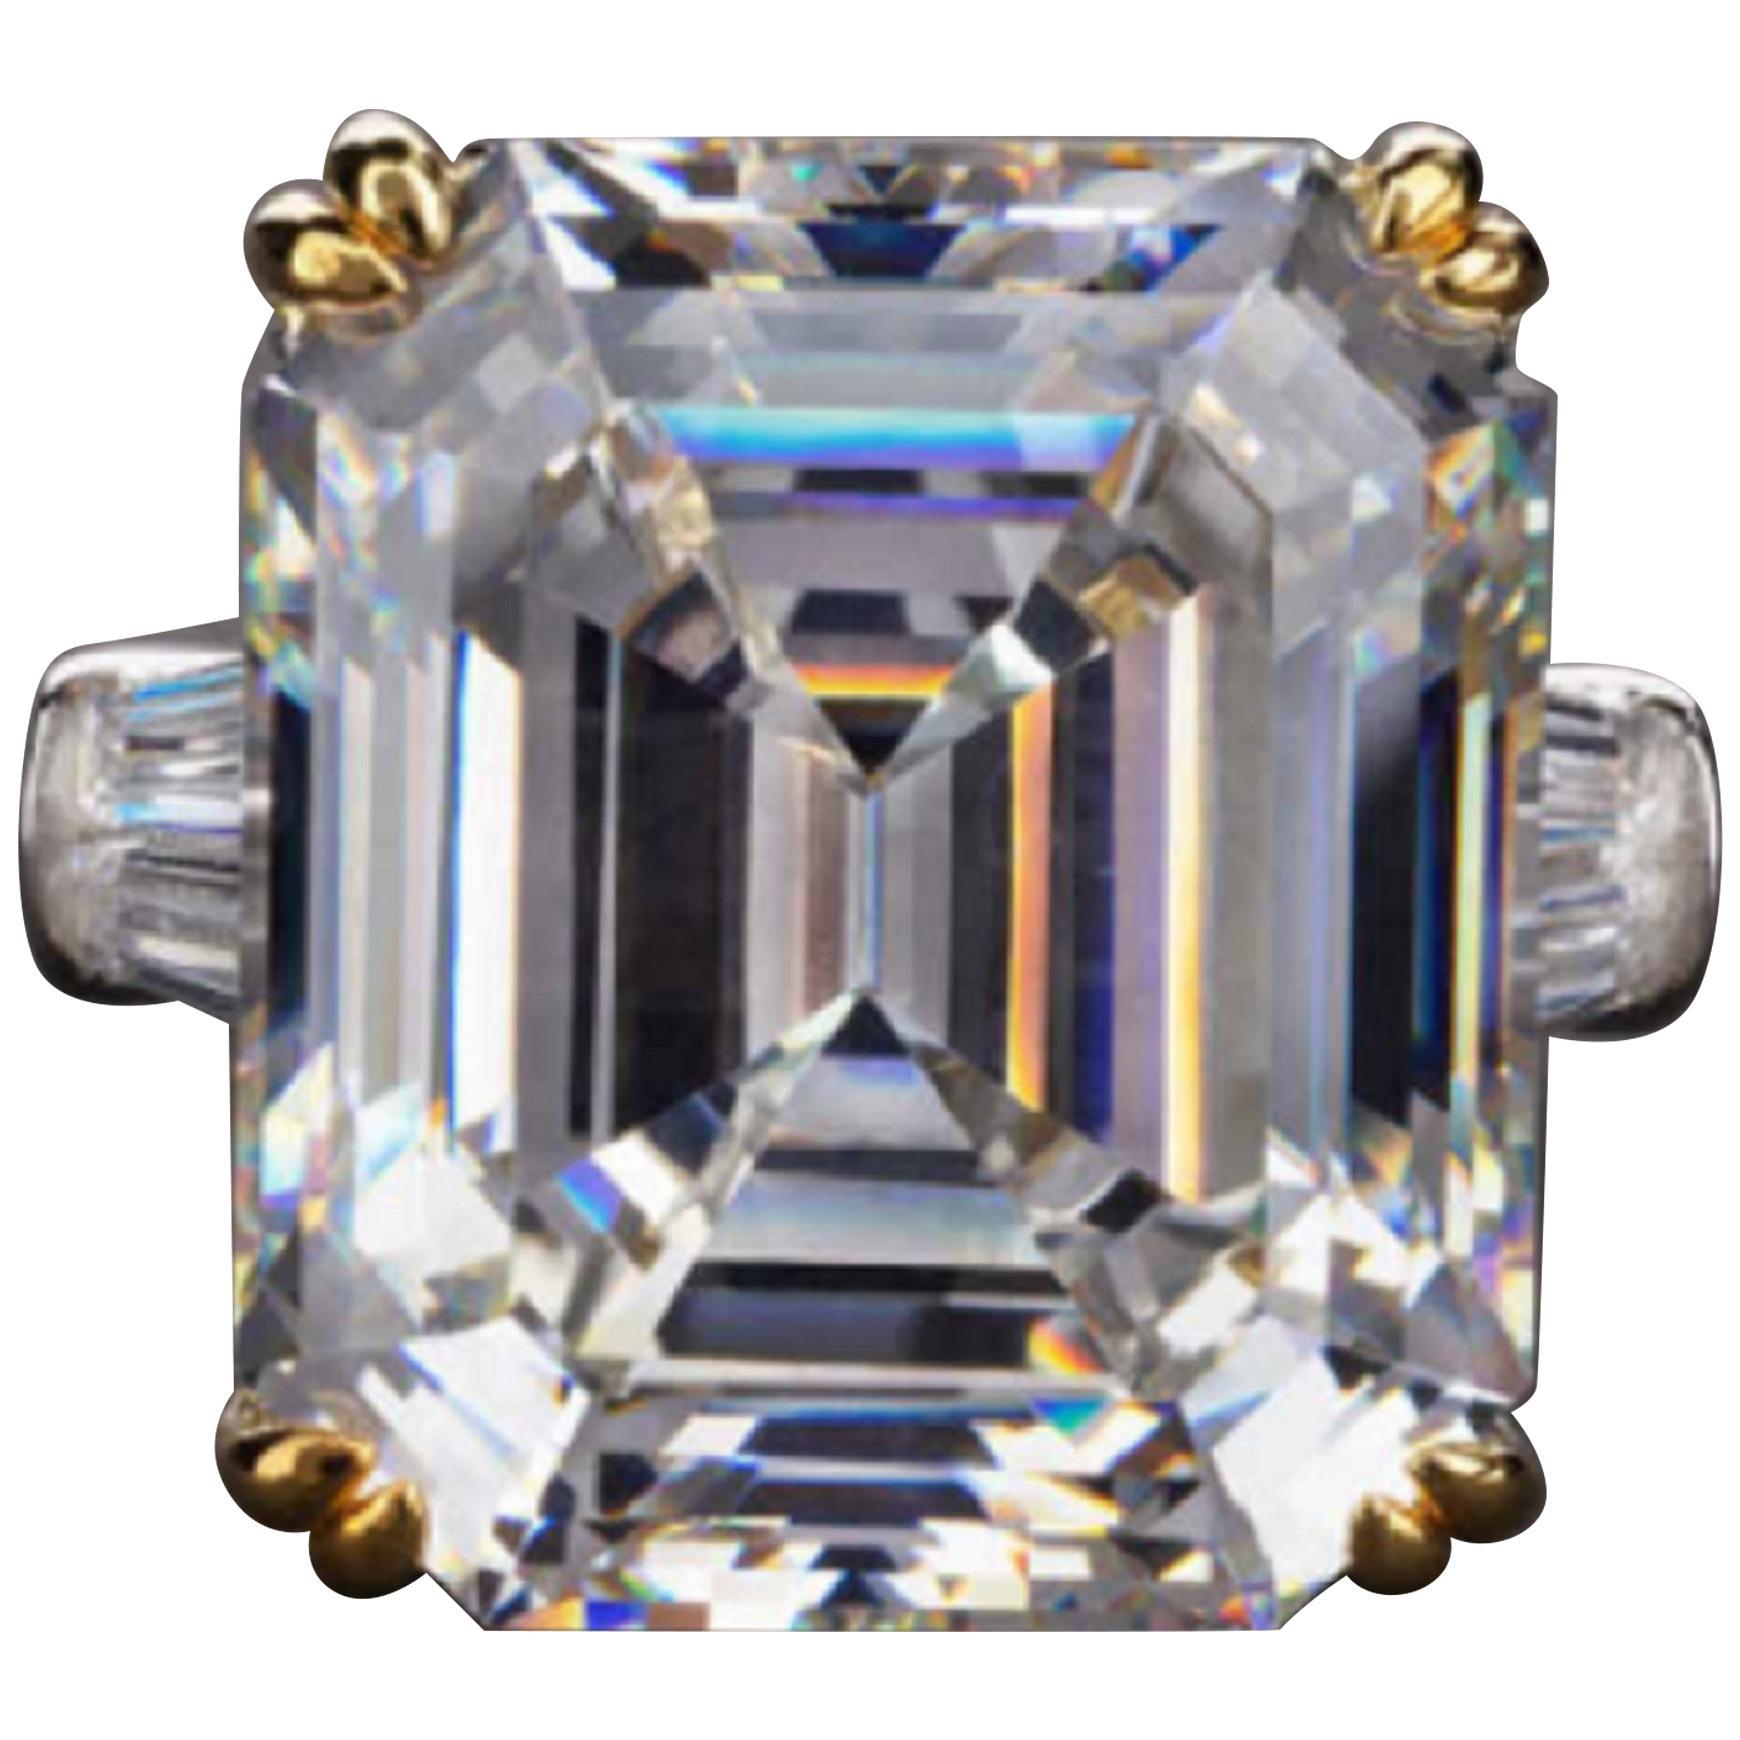 GIA Certified Square Emerald Cut Diamond 5.75 Carat Platinum Ring